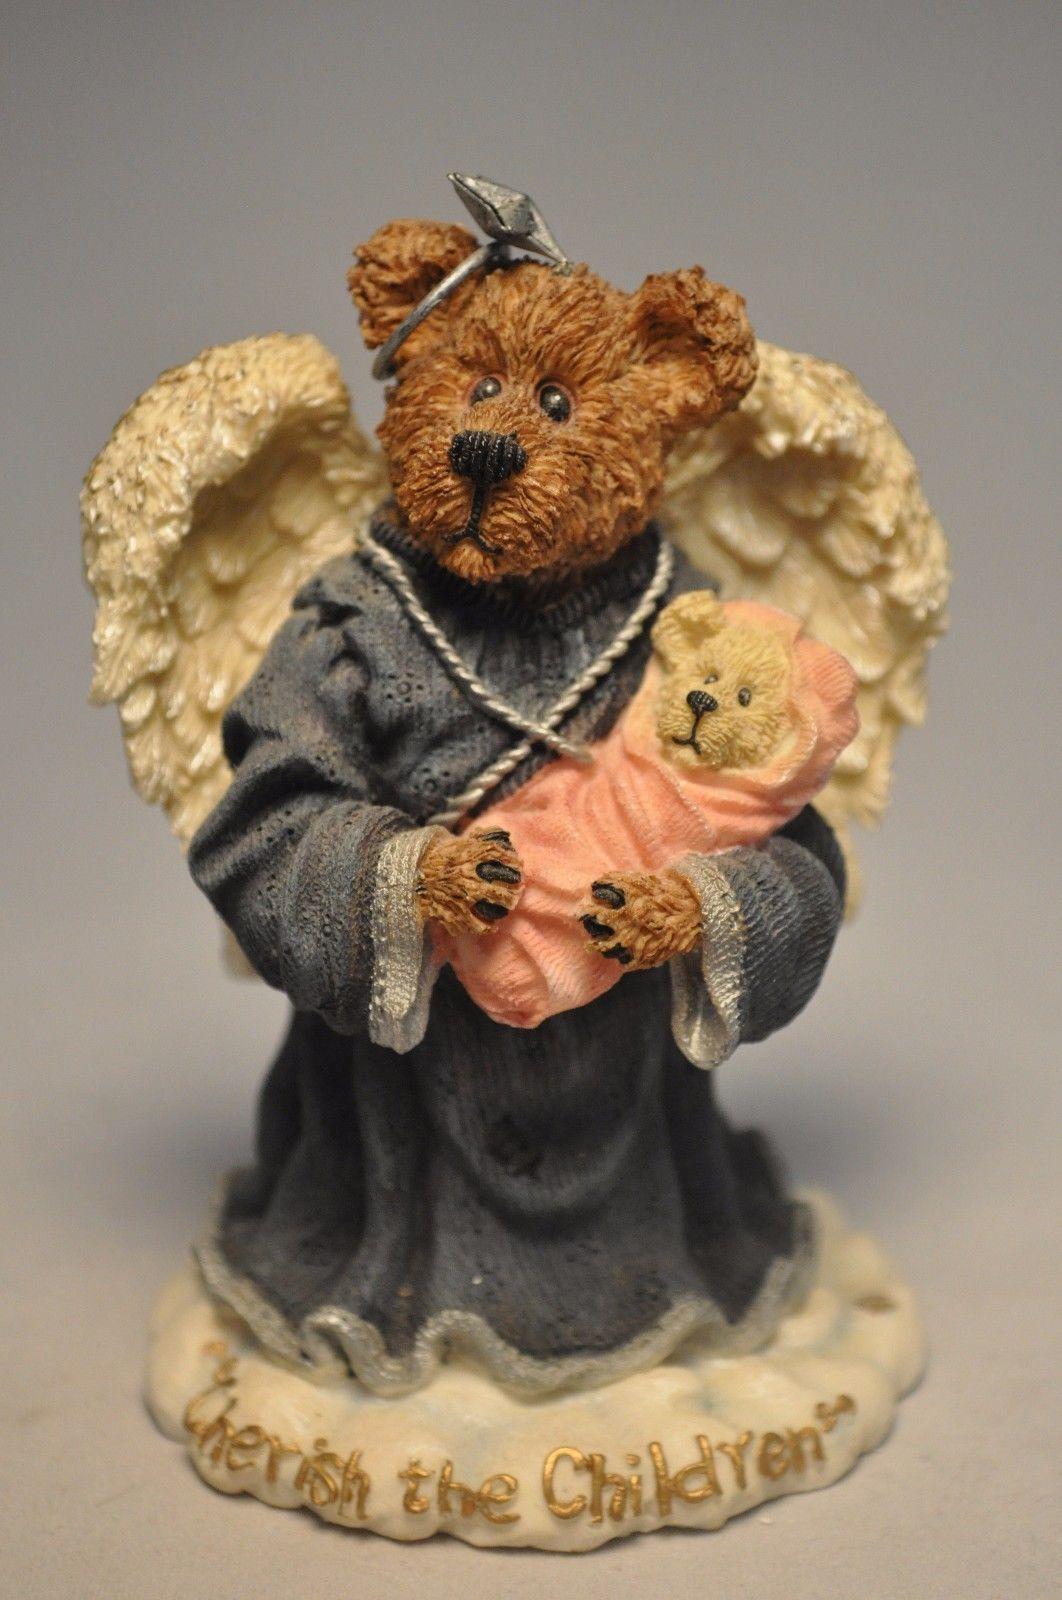 Boyds Bears & Friends: Charity Angelhug & Everychild... 228343 Cherish The Child image 2